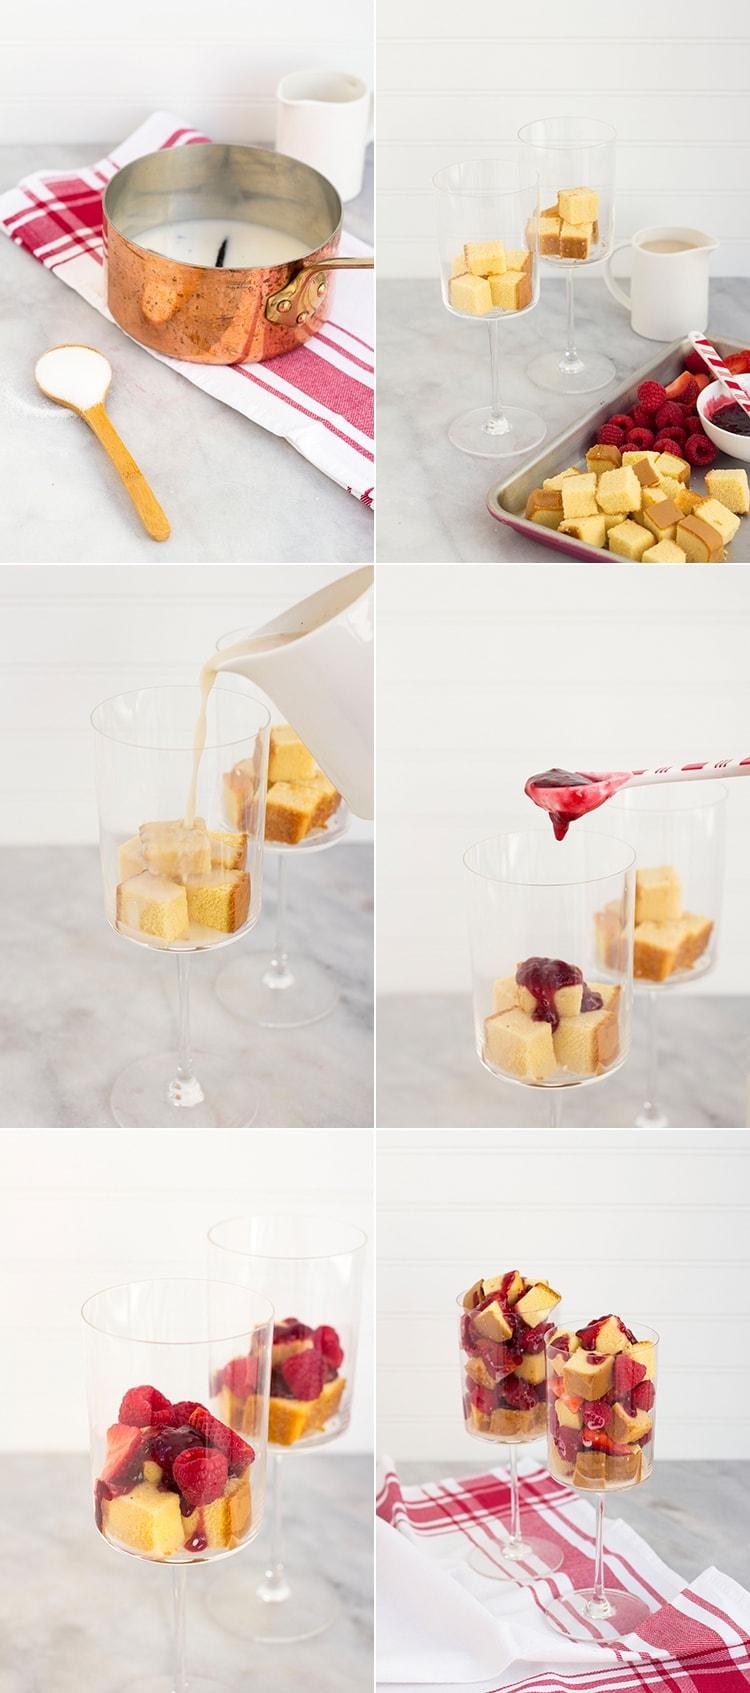 Berries and Cream Parfait